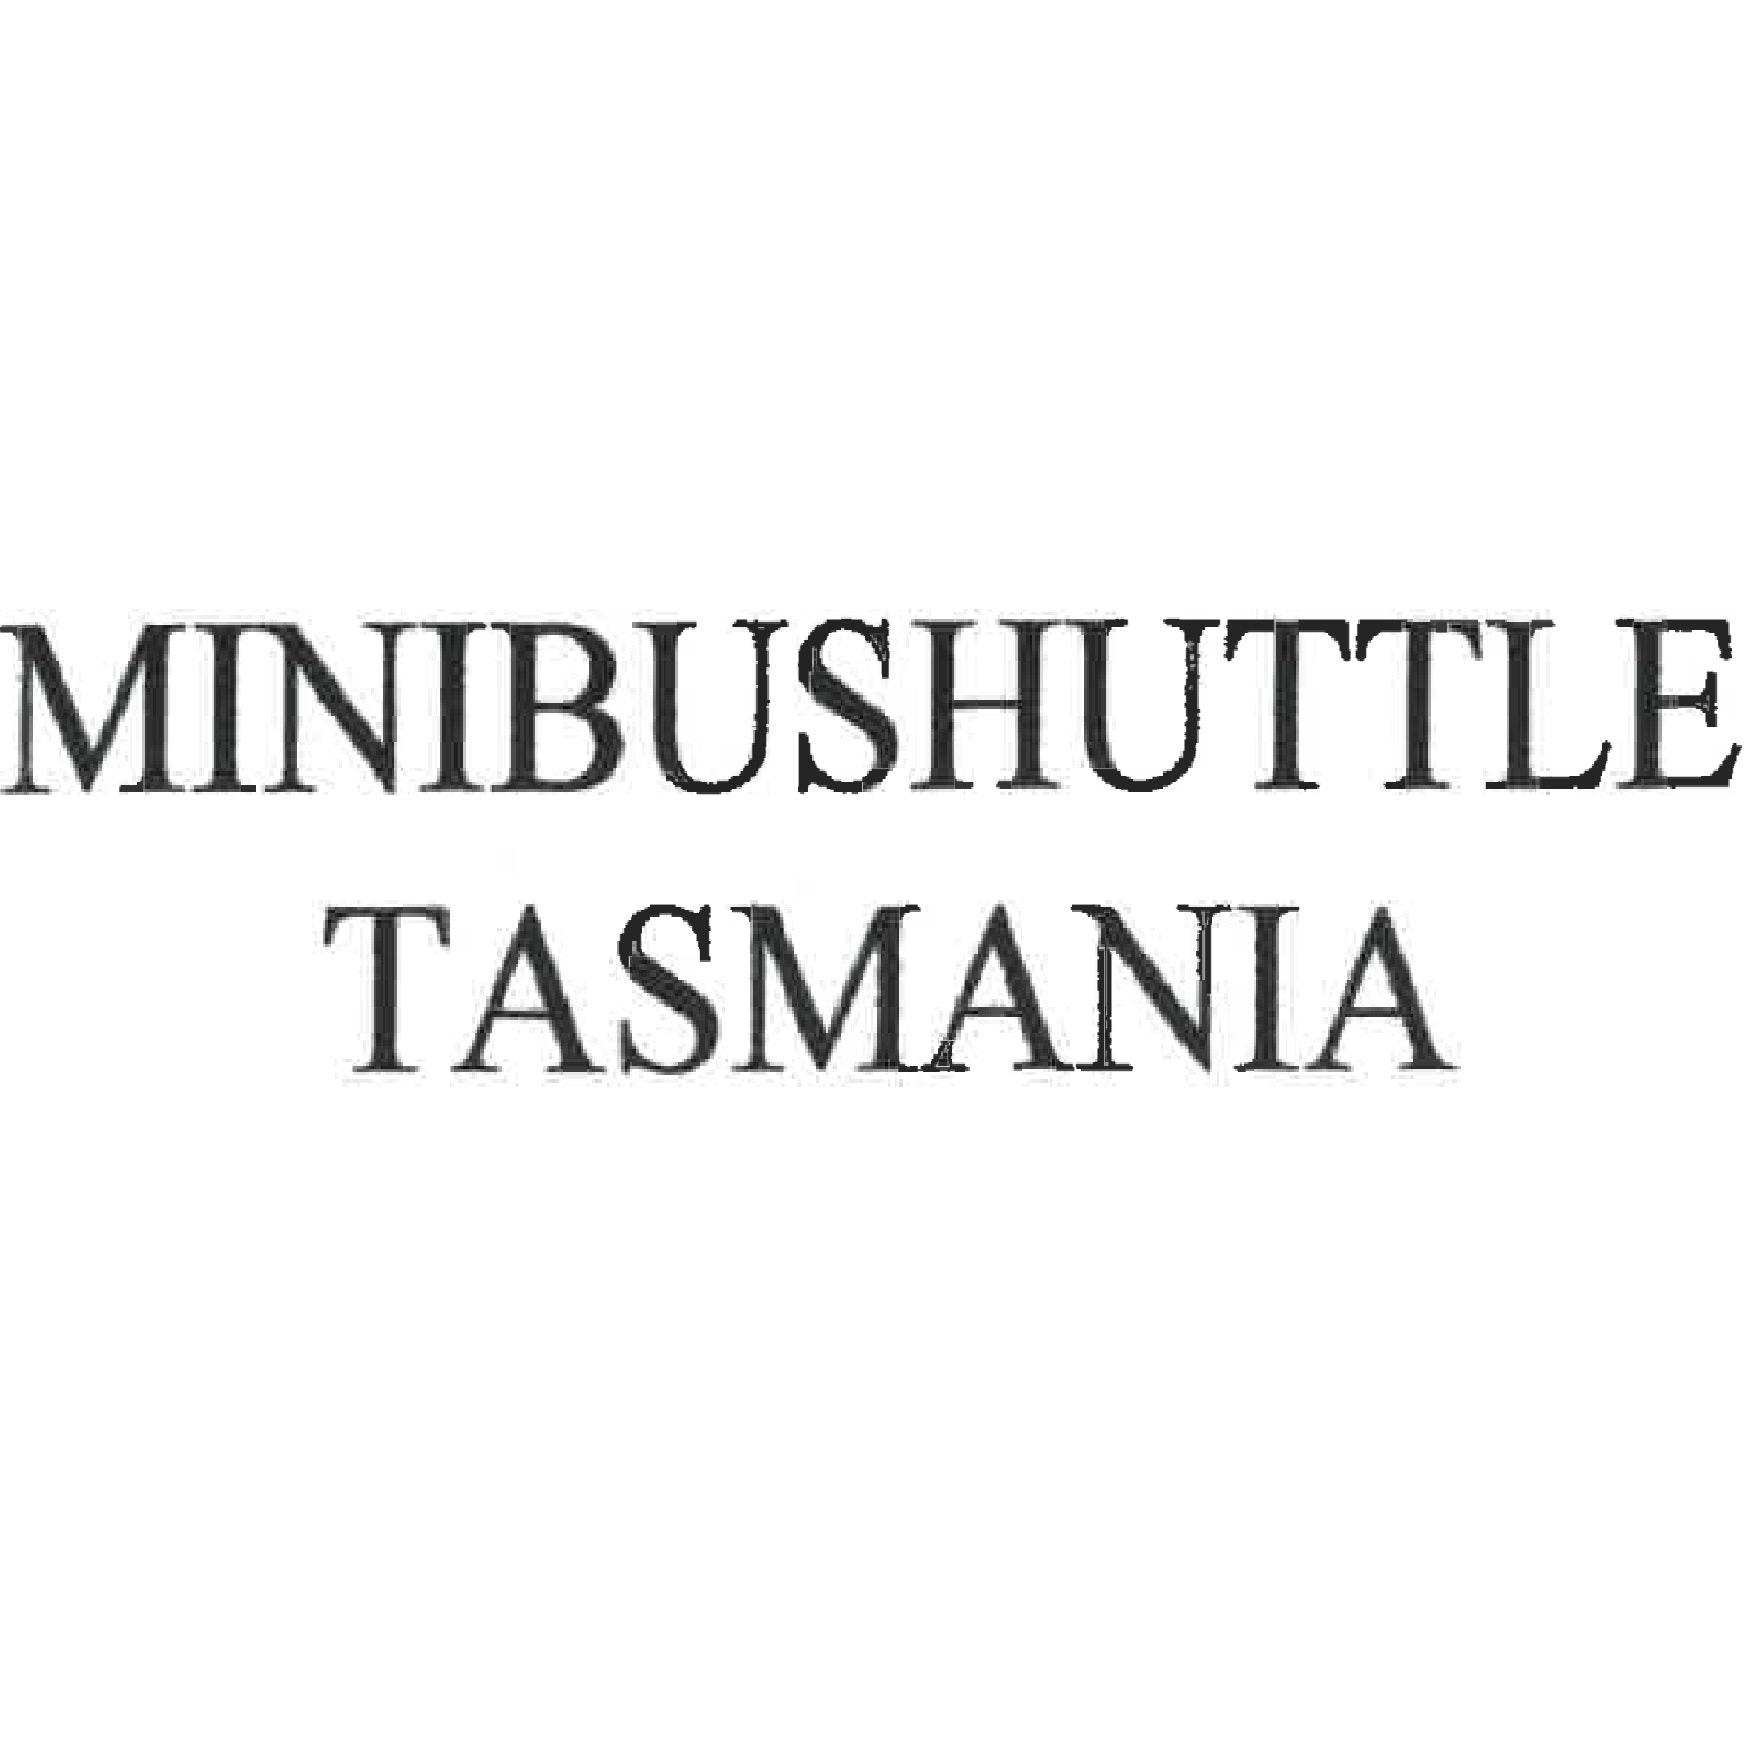 Mini Bus Shuttle Tasmania